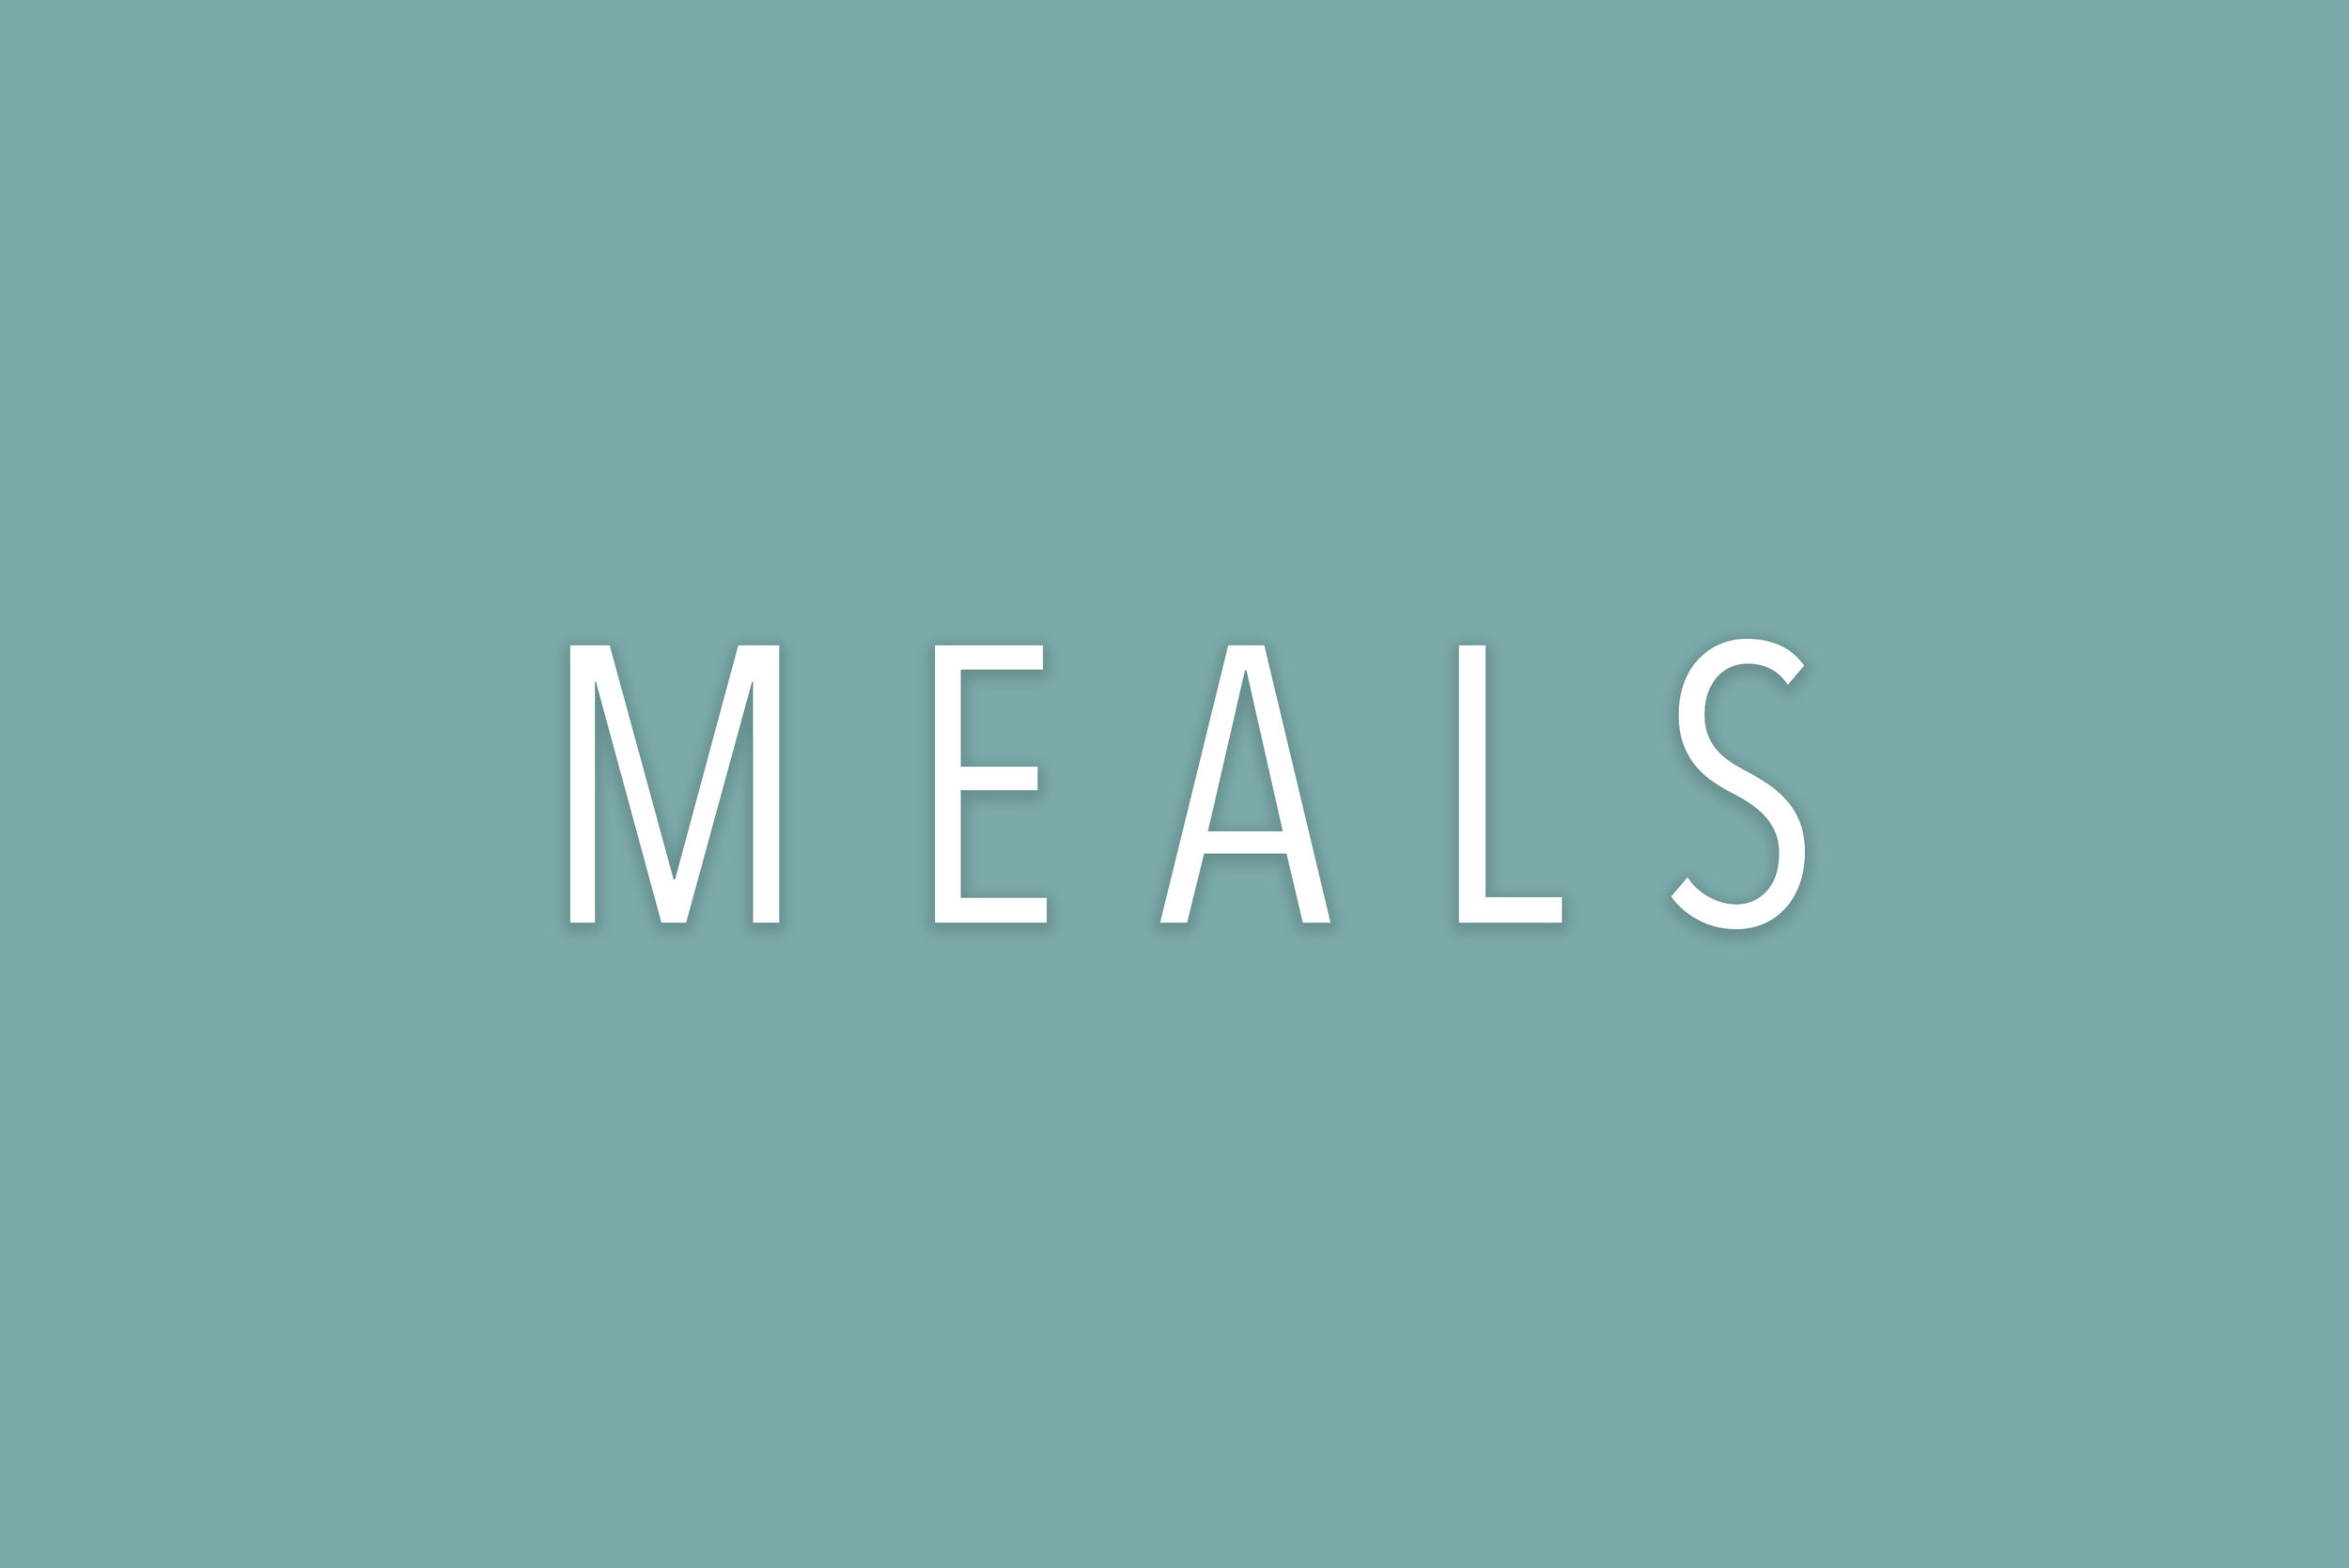 AI_meals.jpg